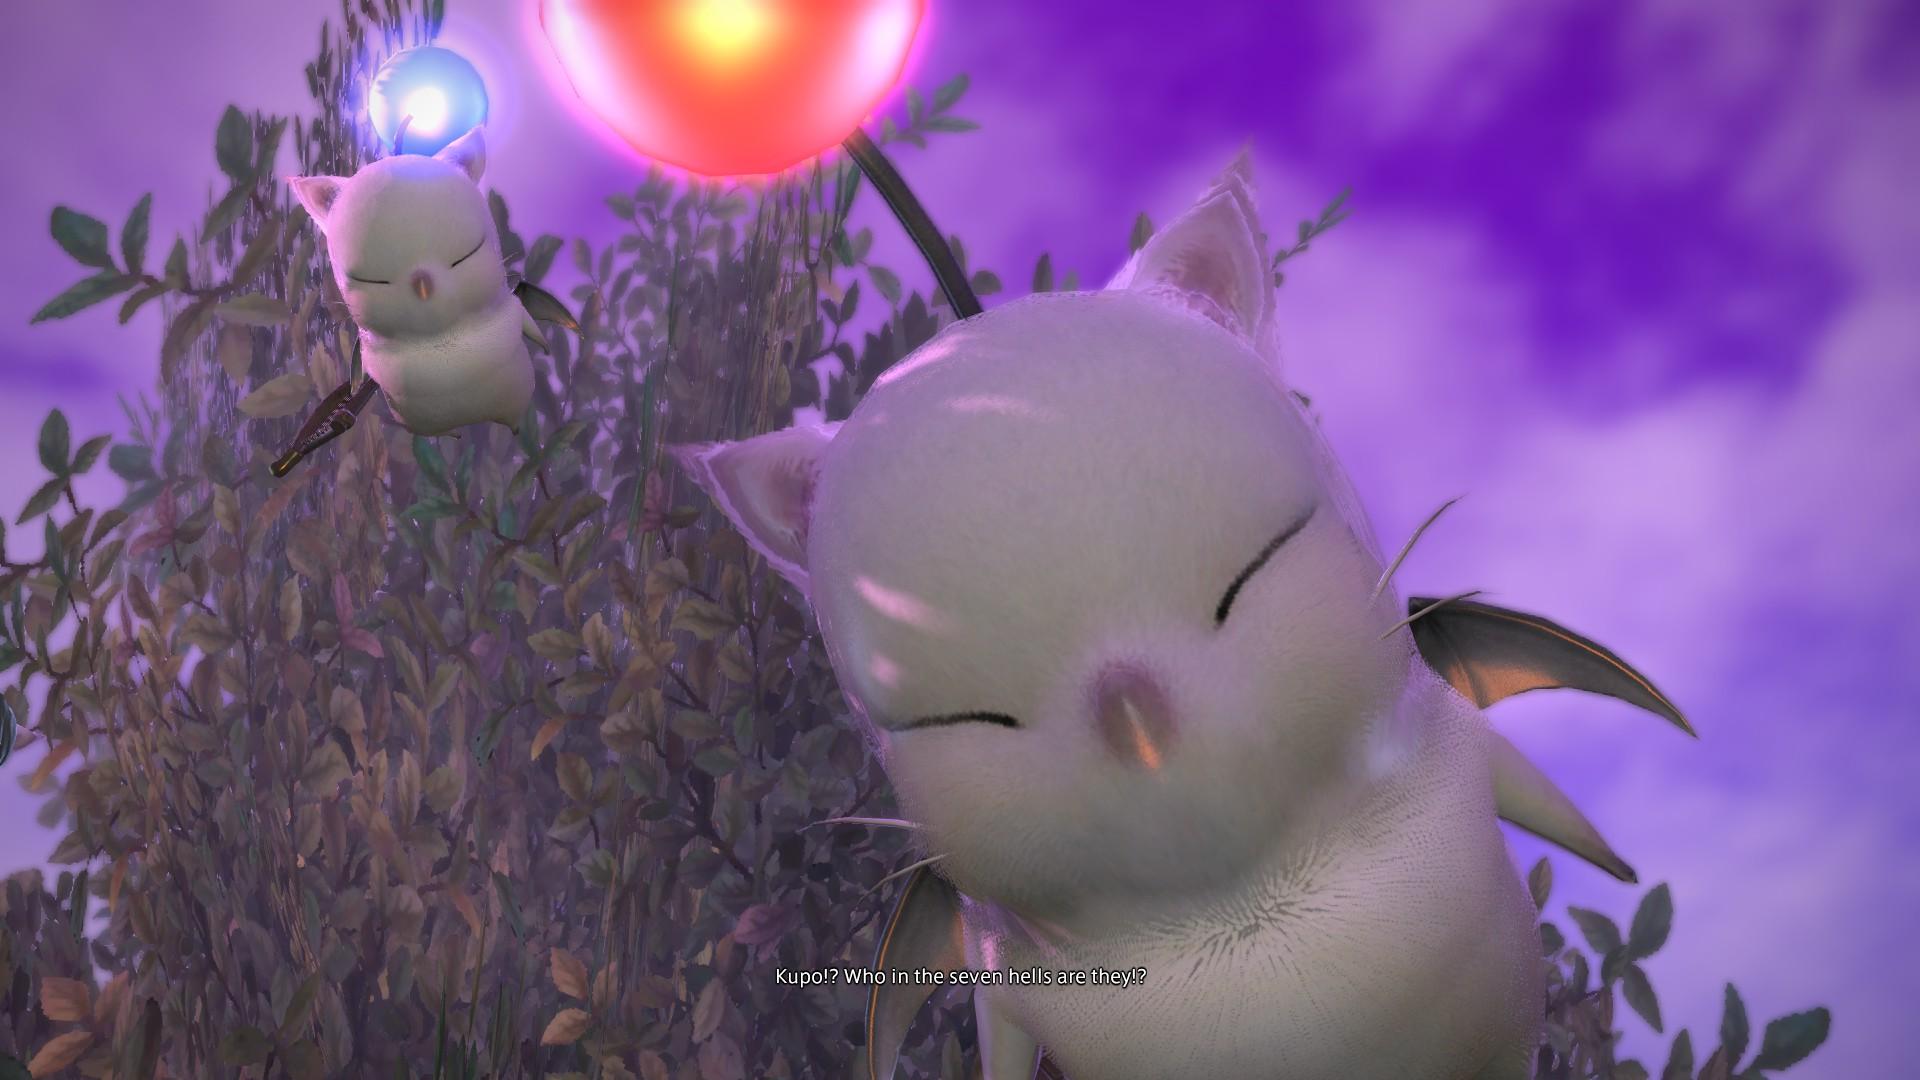 O2 customers in UK get free Final Fantasy 14 goodies